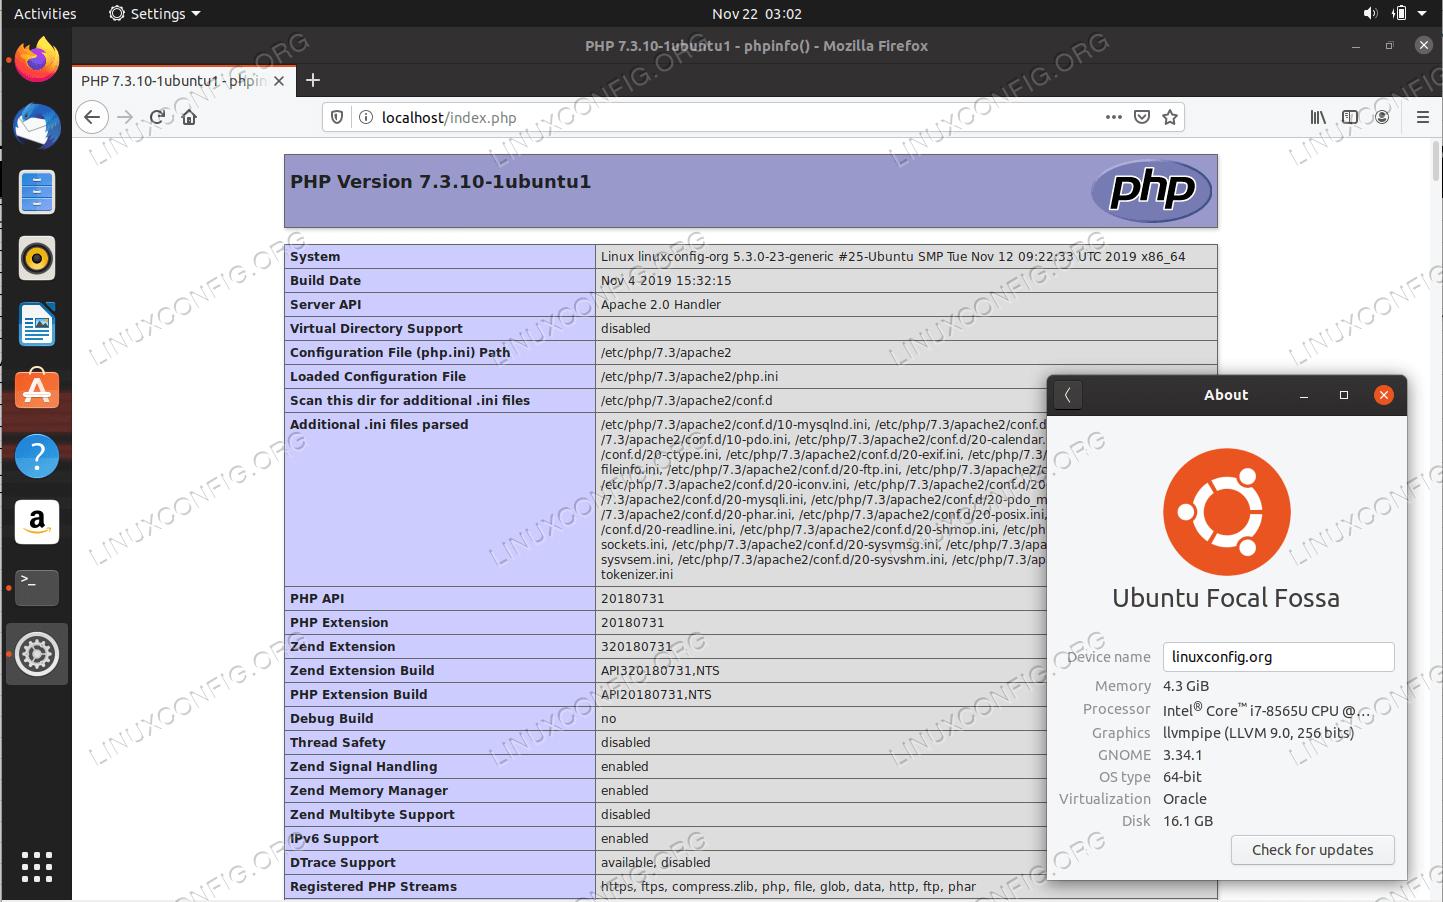 LAMP server setup on Ubuntu 20.04 Focal Fossa